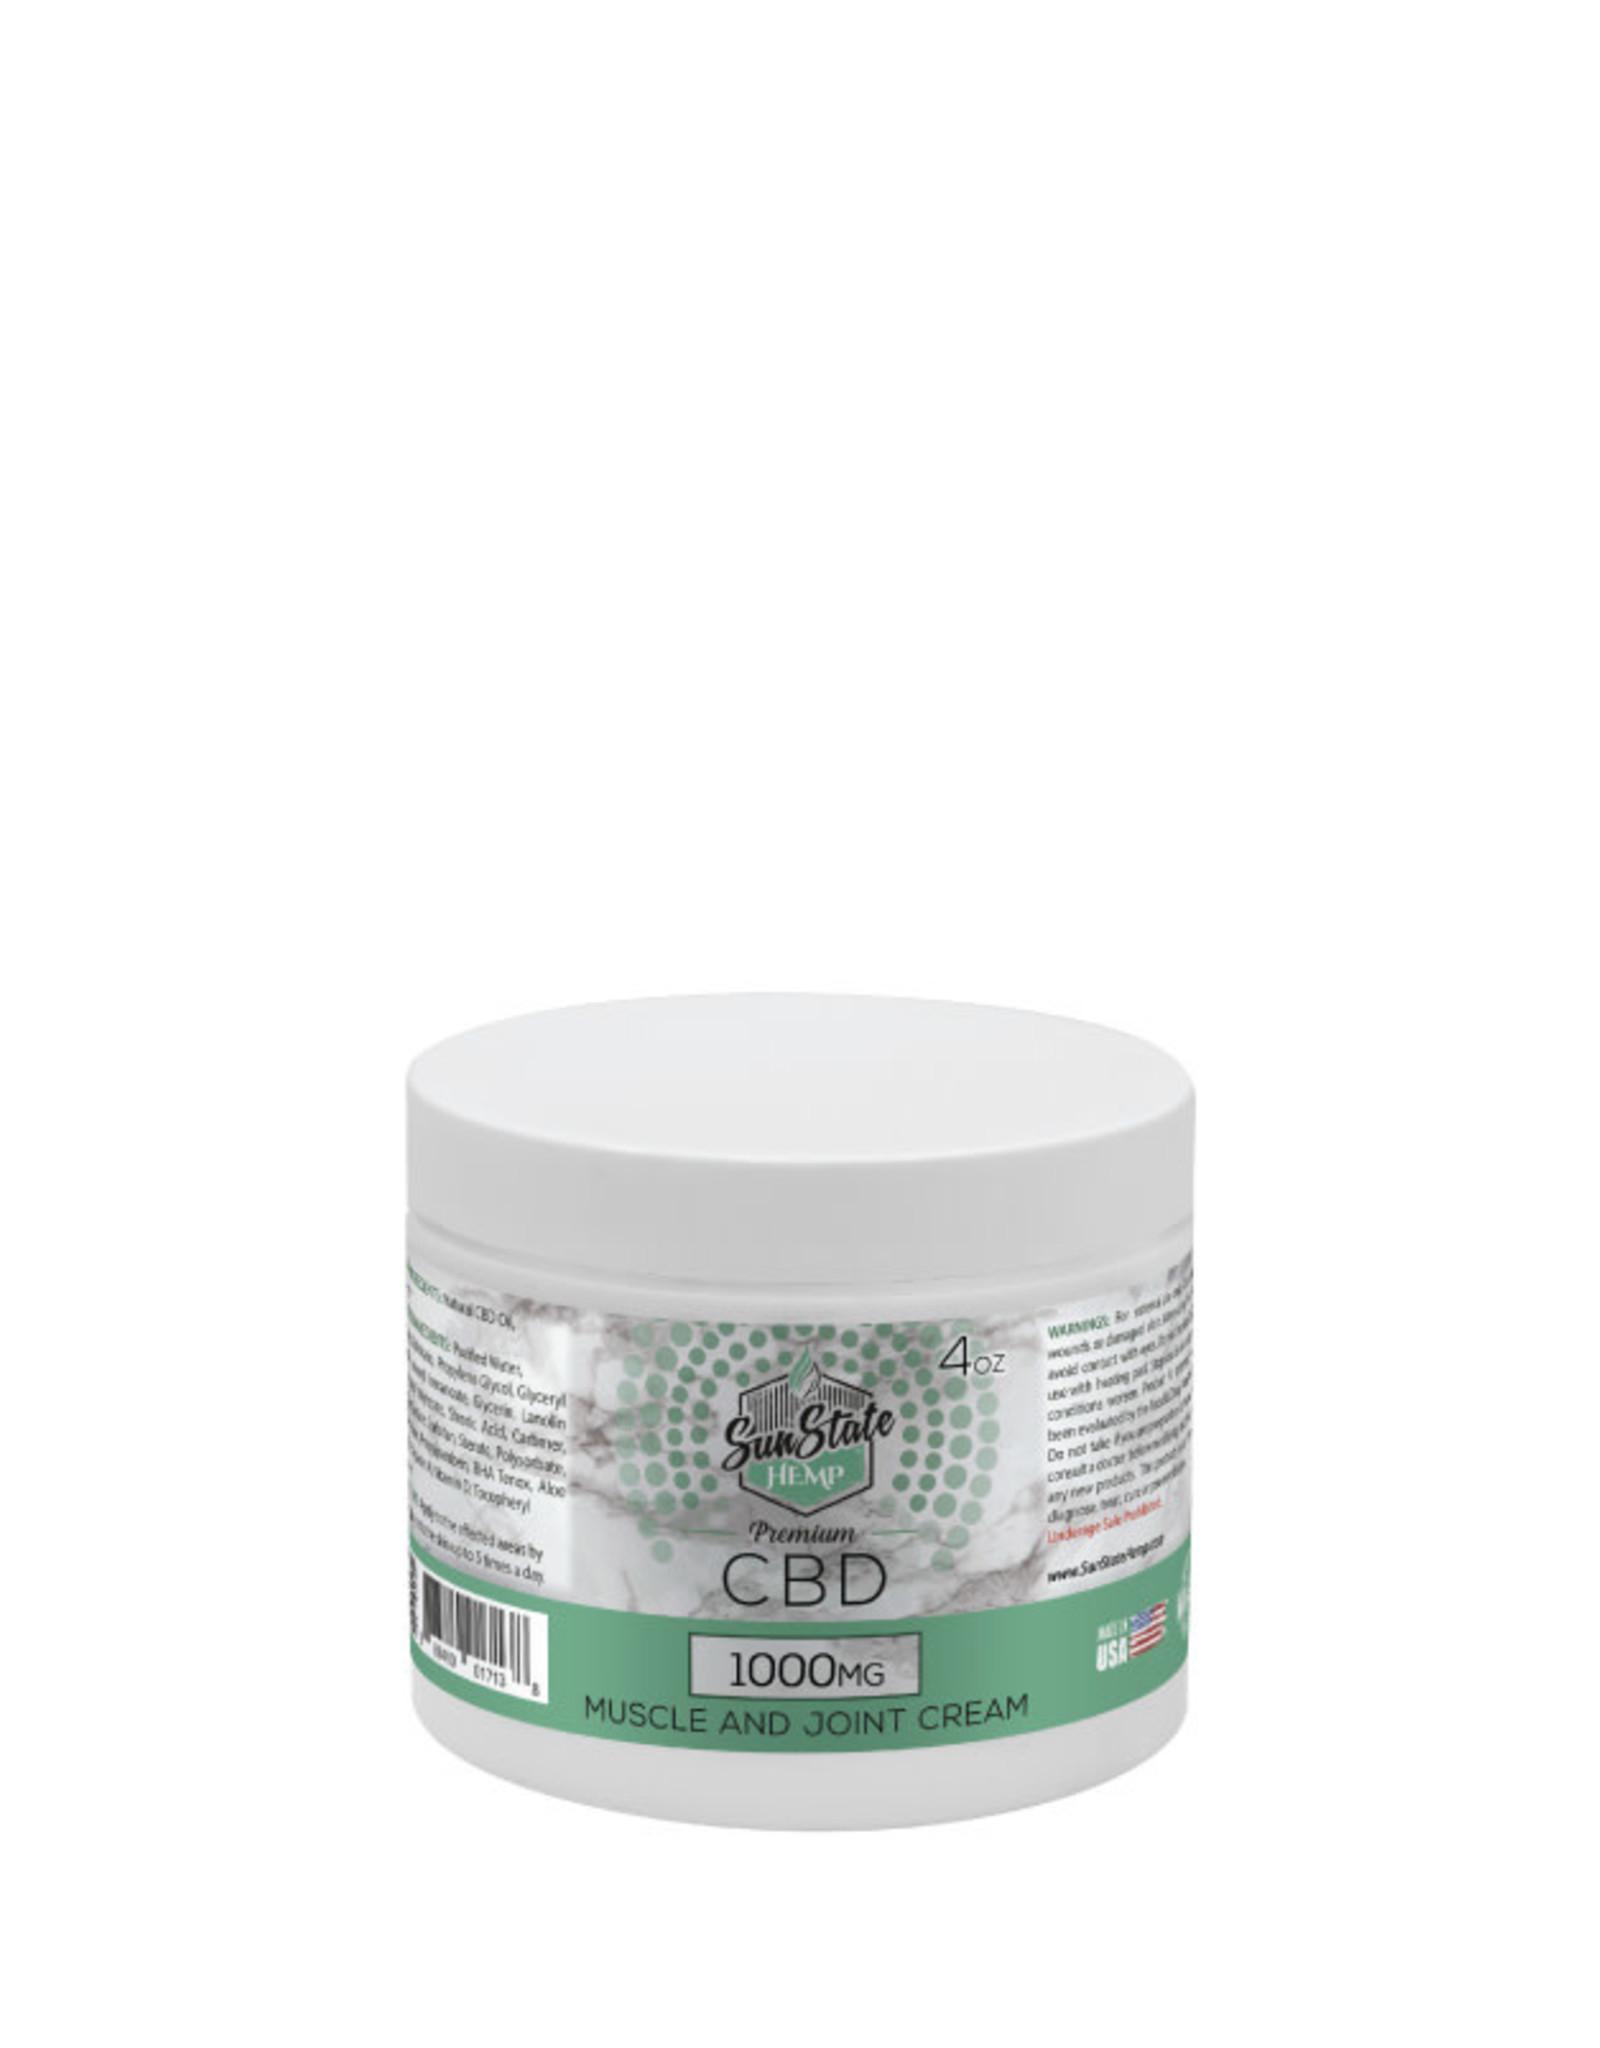 SunState Hemp SunState Pain Cream 1000mg